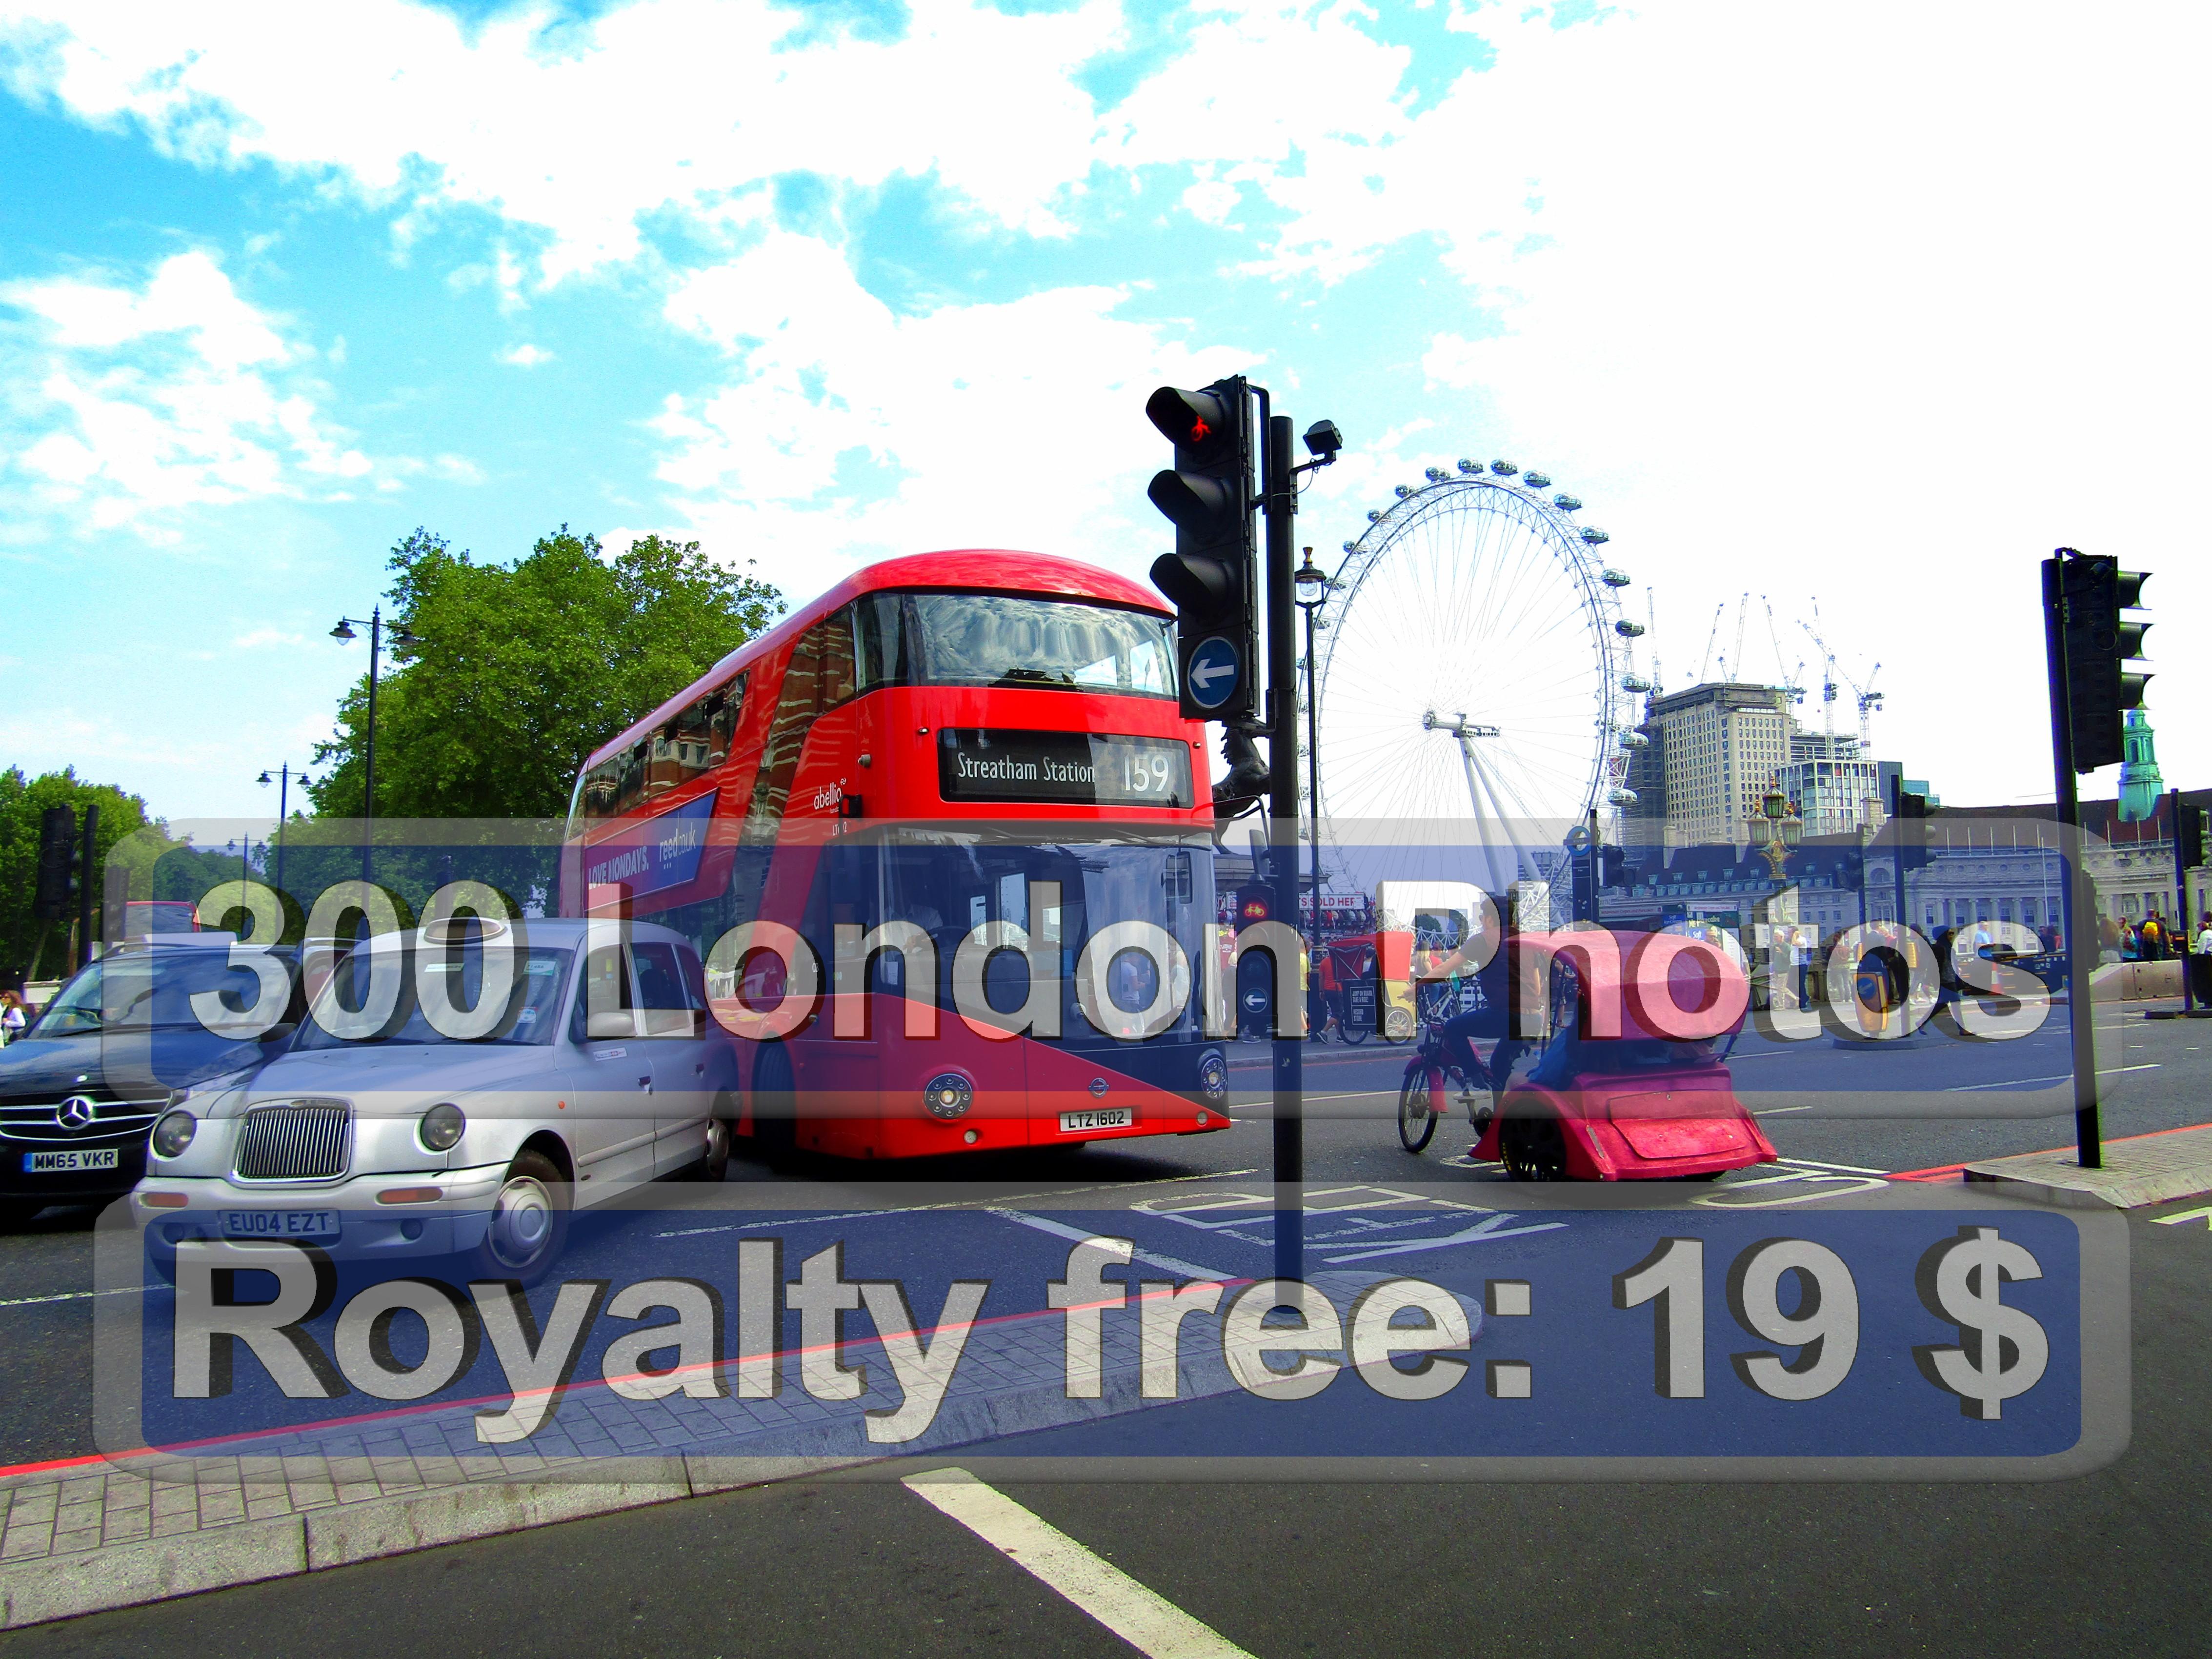 9020 London Photo